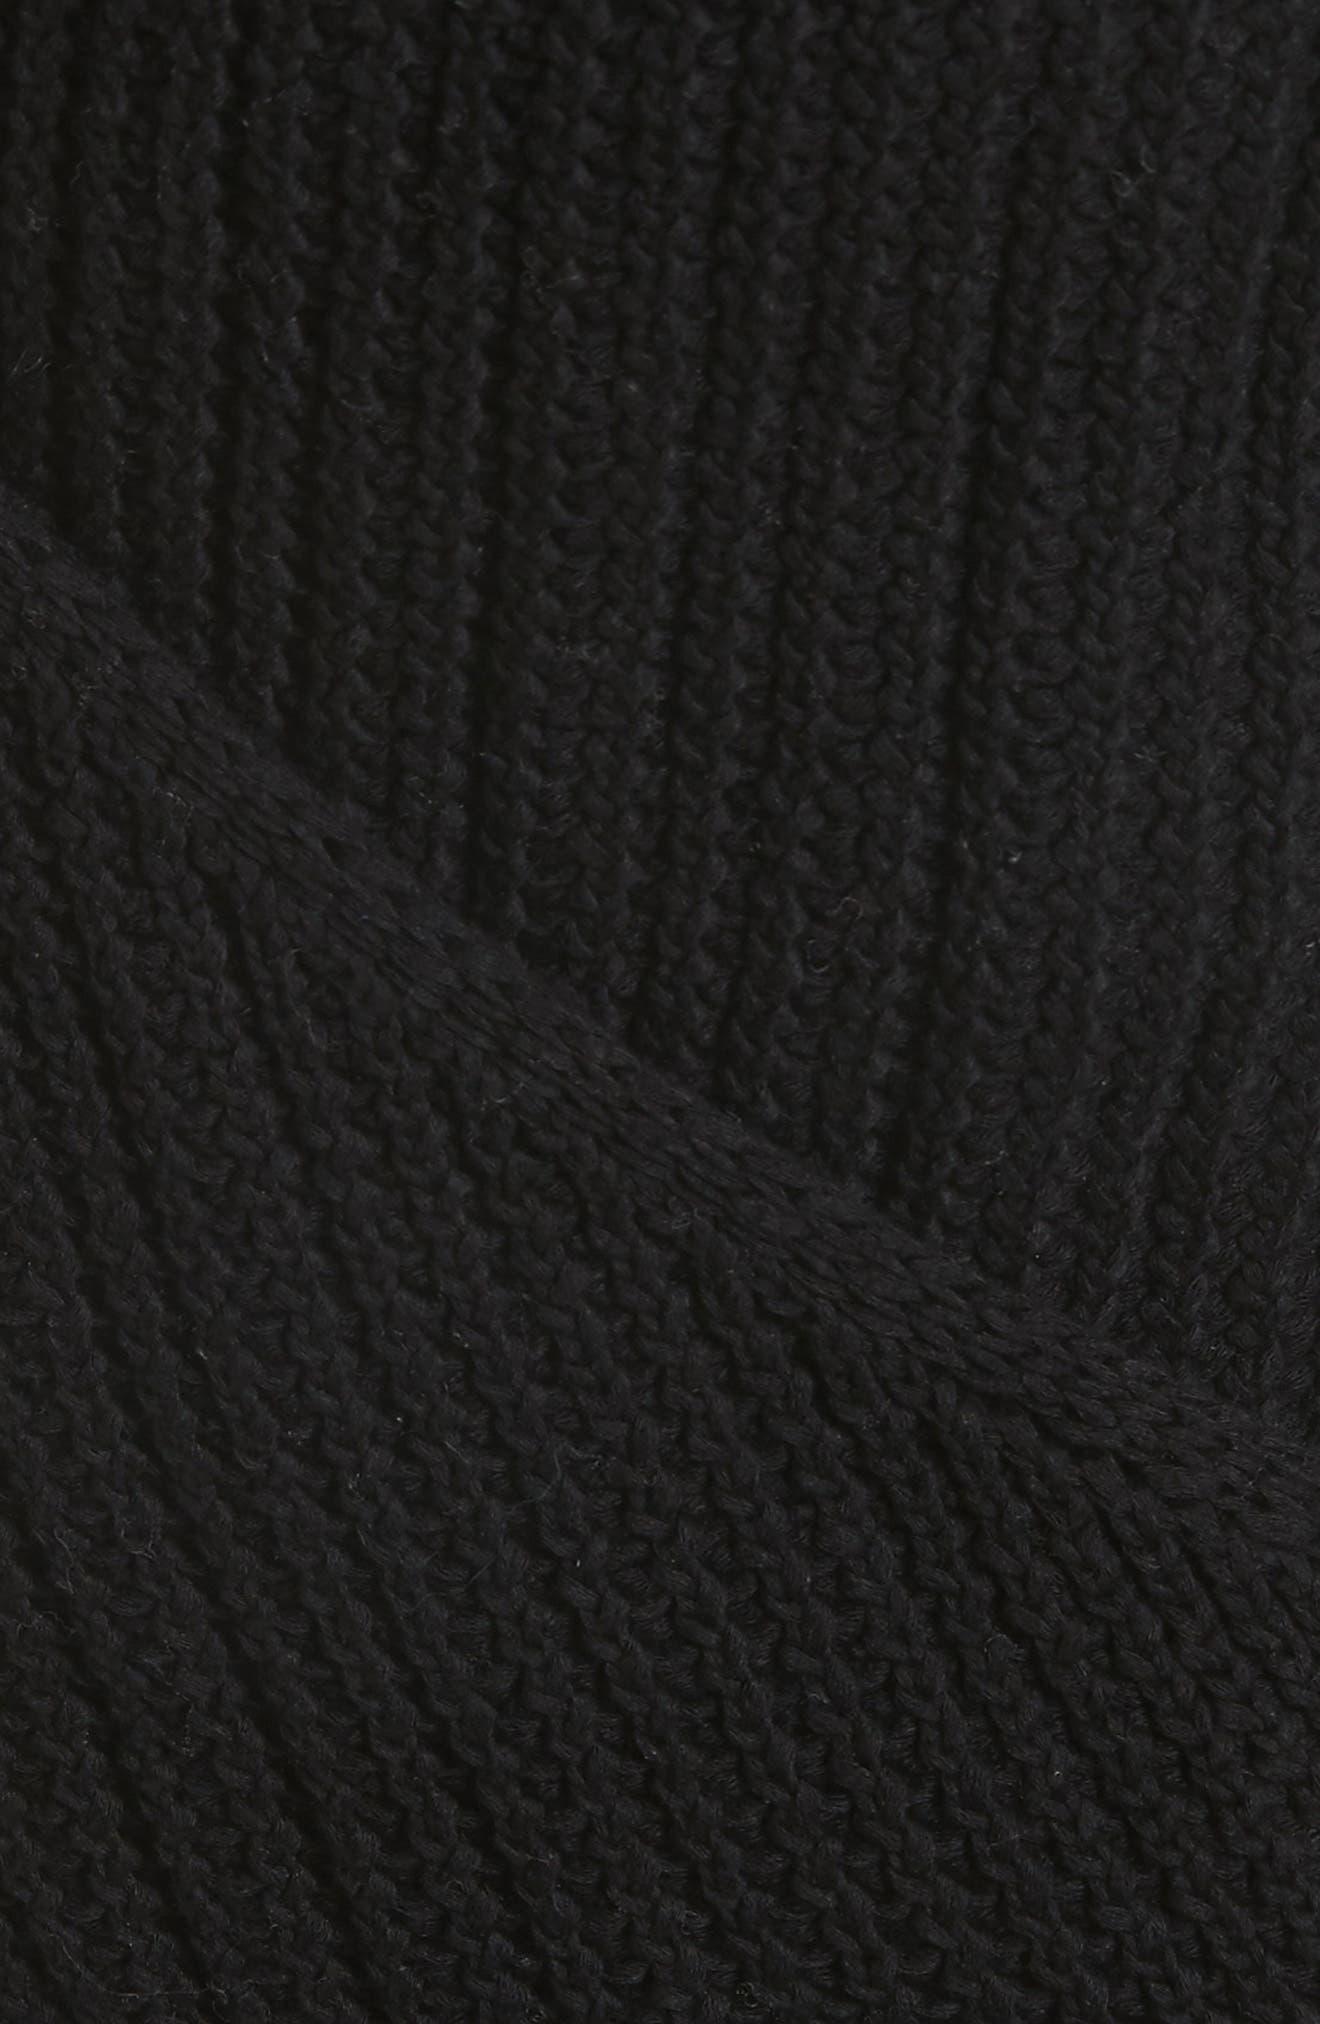 Crossover Back Tank Sweater,                             Alternate thumbnail 5, color,                             Black